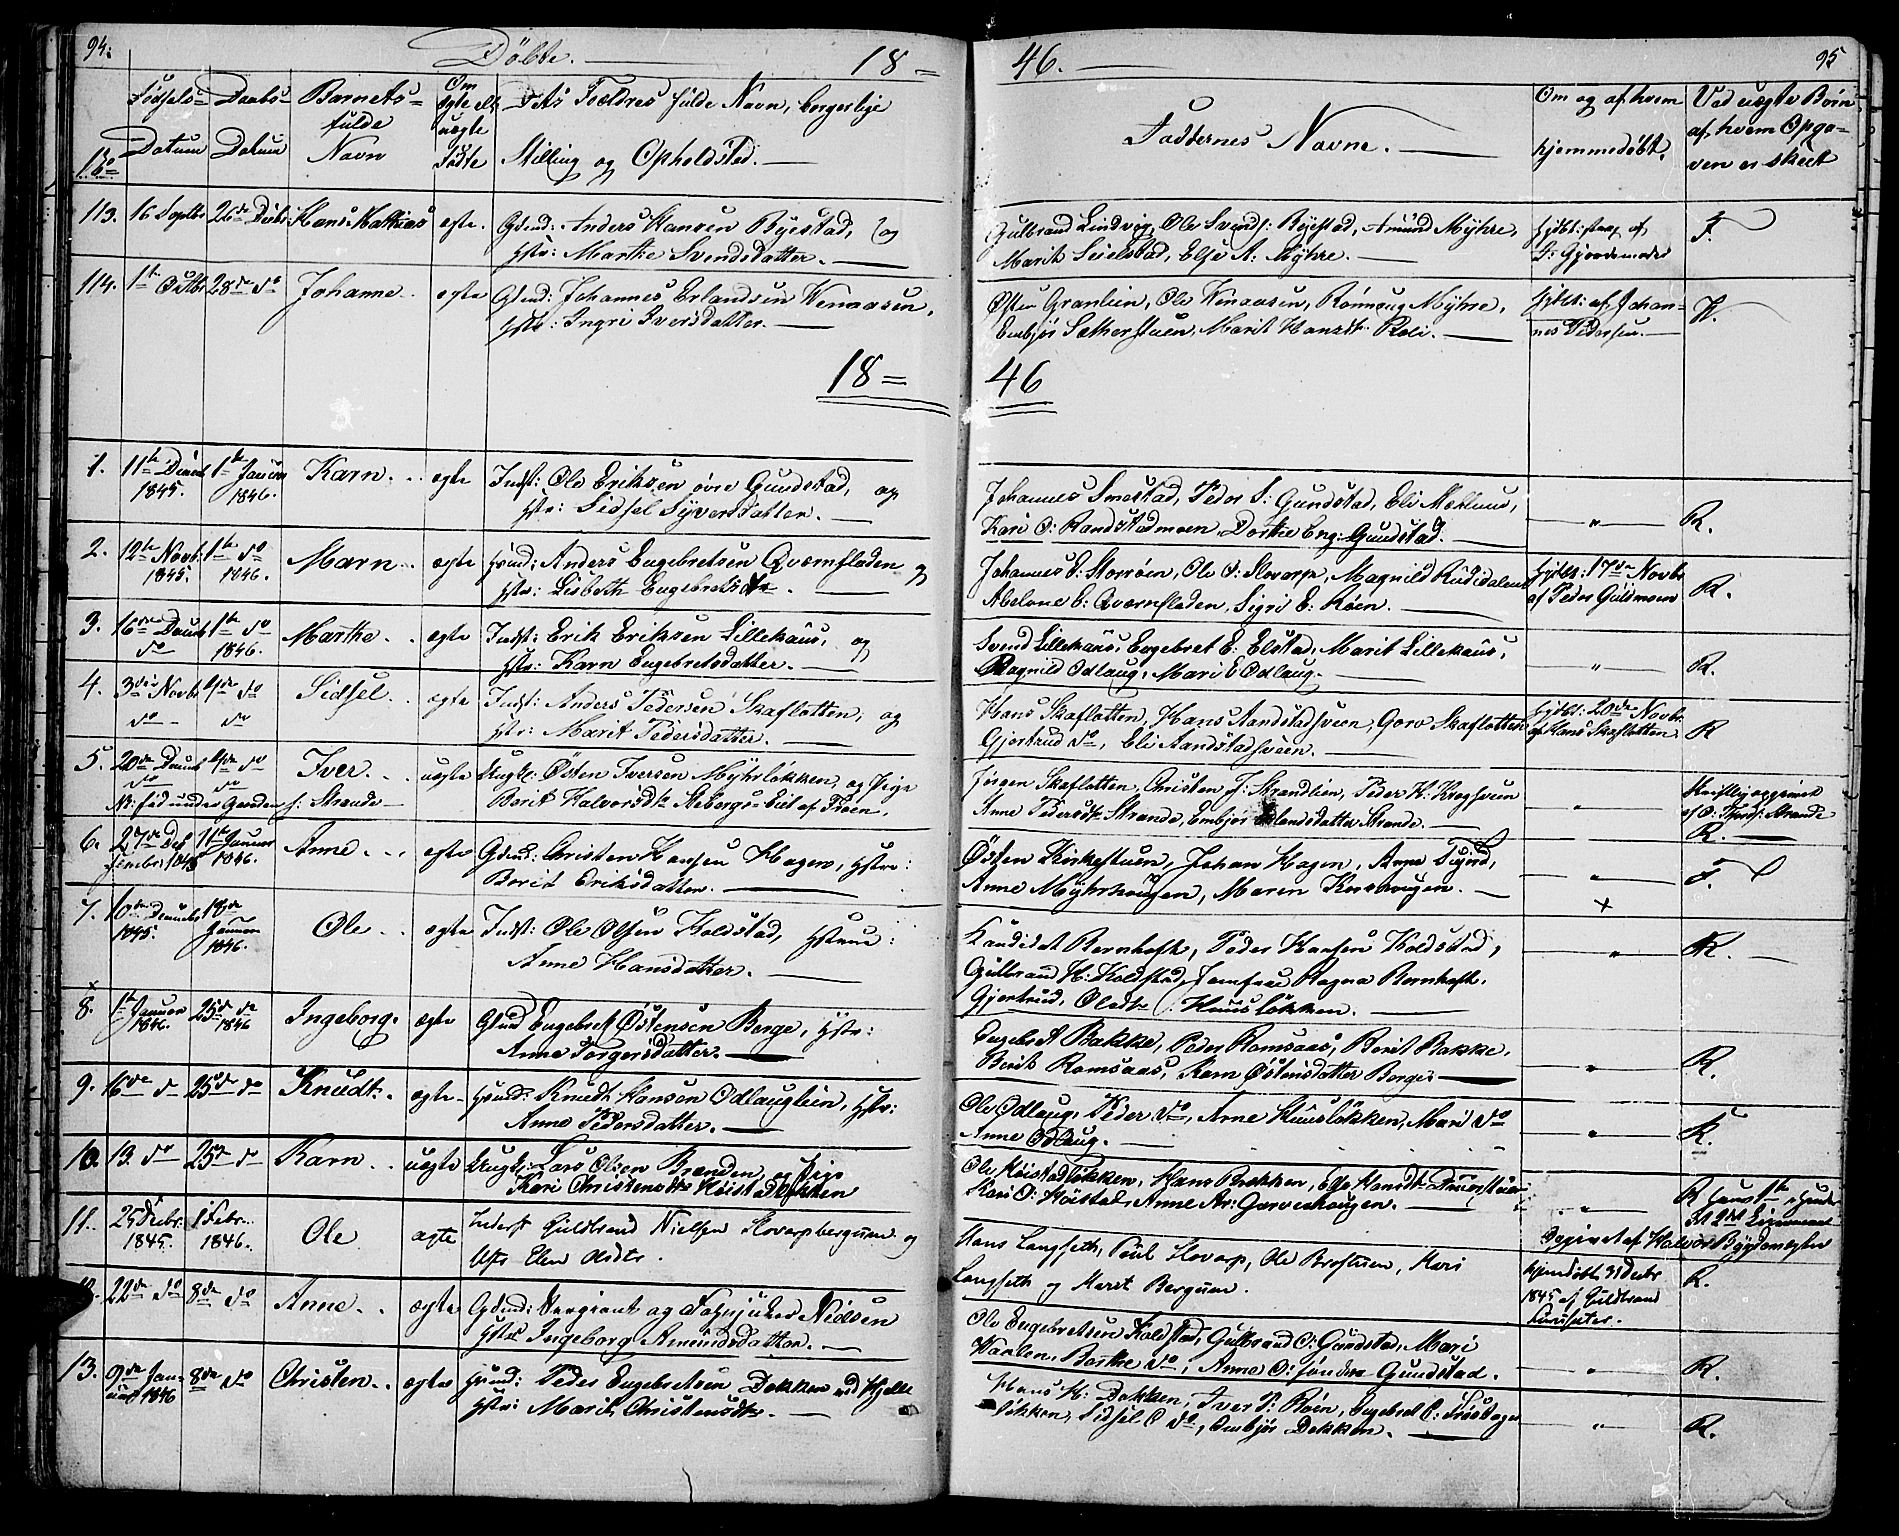 SAH, Ringebu prestekontor, Klokkerbok nr. 2, 1839-1853, s. 94-95